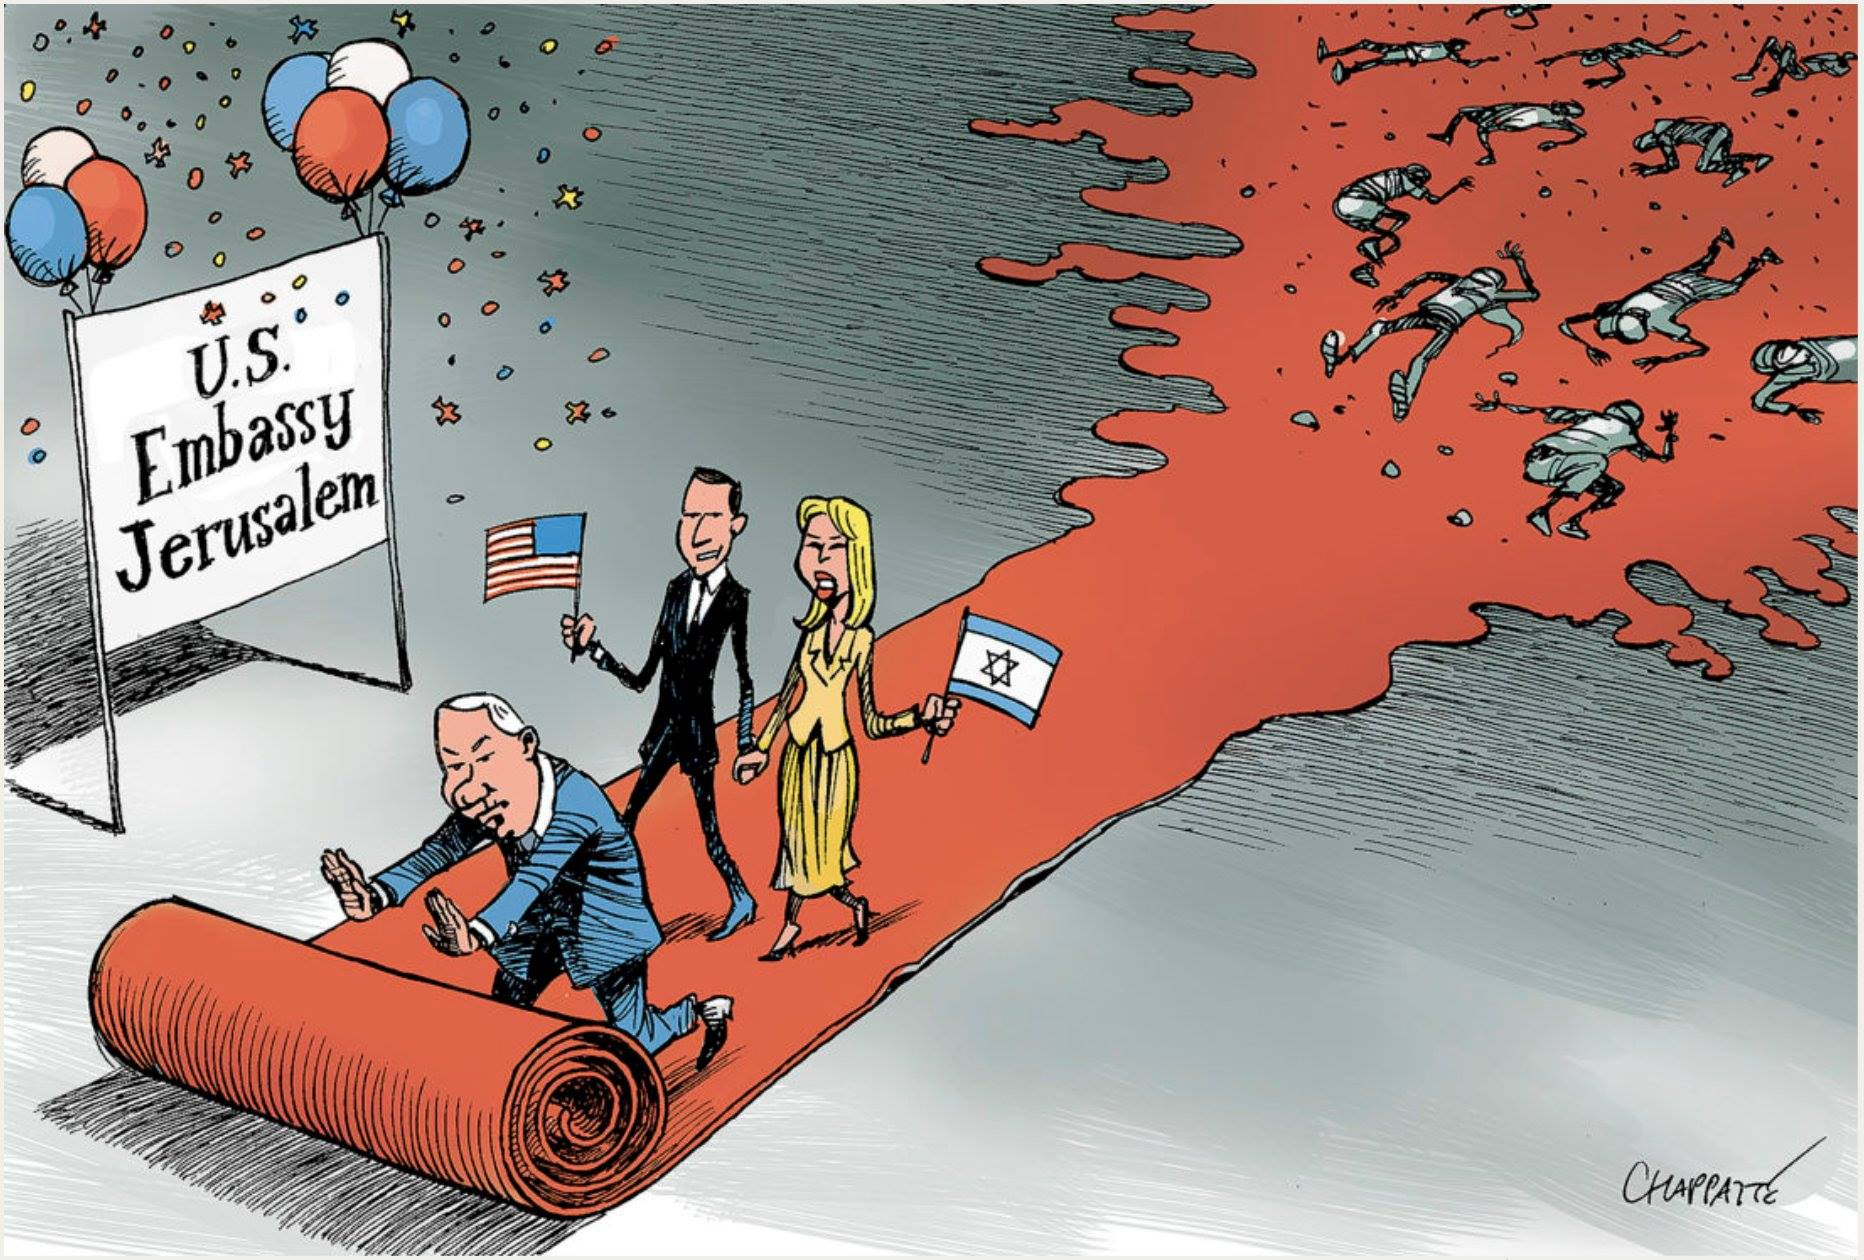 US embassy moved to Jerusalem - Cartoon [Chappatte/Twitter]